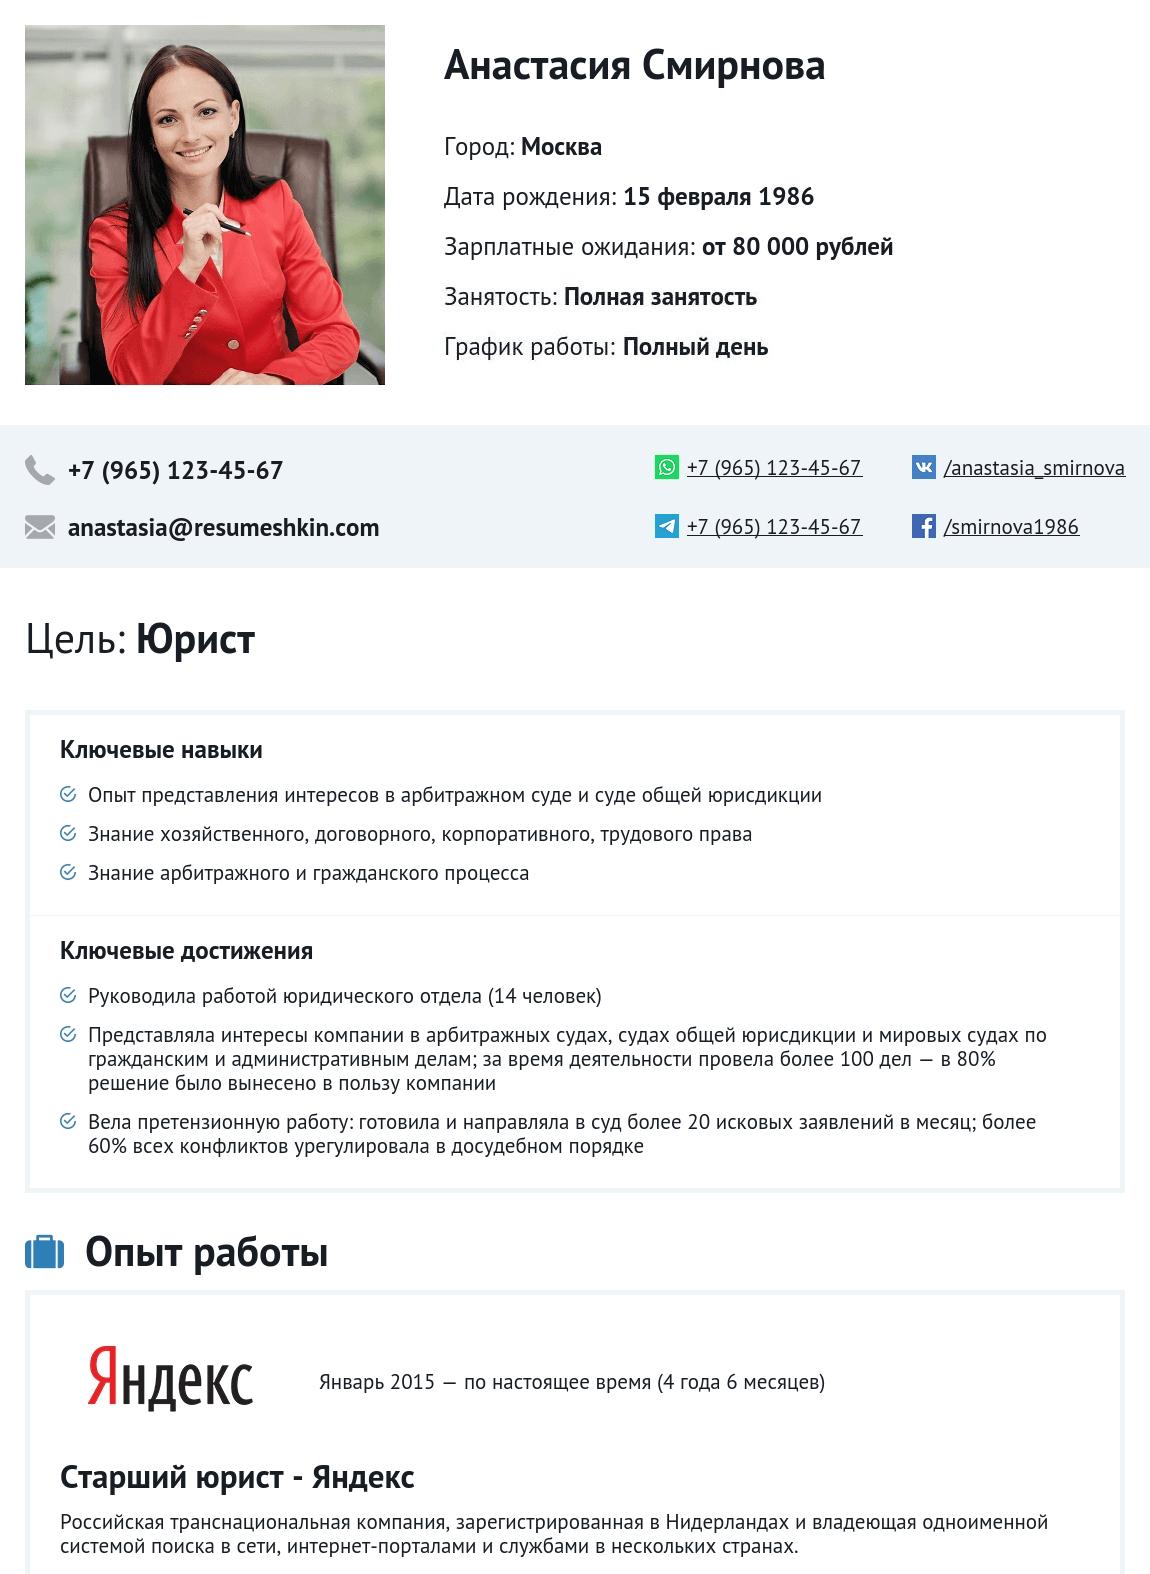 professionalnye navyki prodavca v rezjume